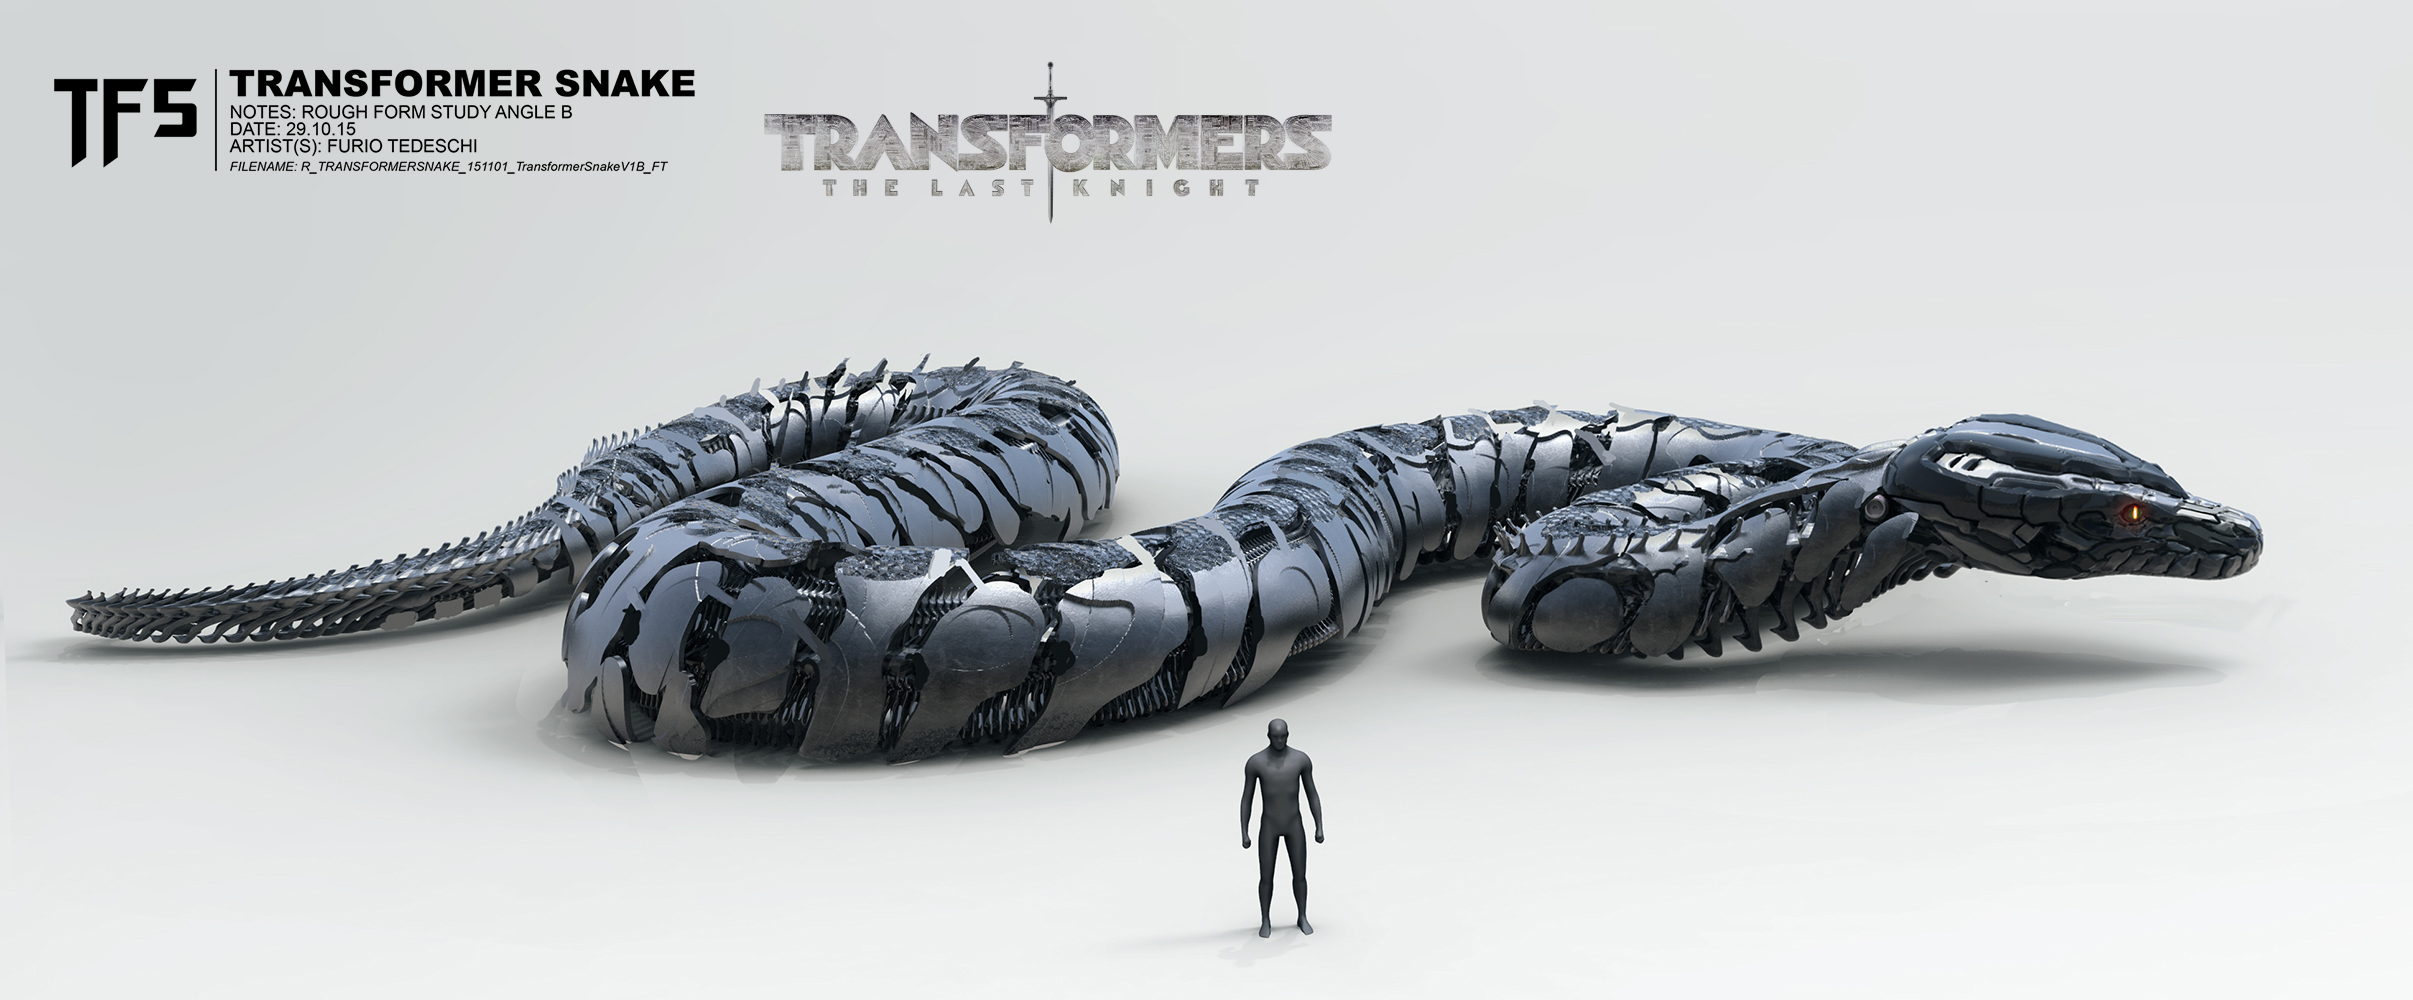 R_TRANSFORMERSNAKE_151101_TransformerSnakeV1B_FT.jpg